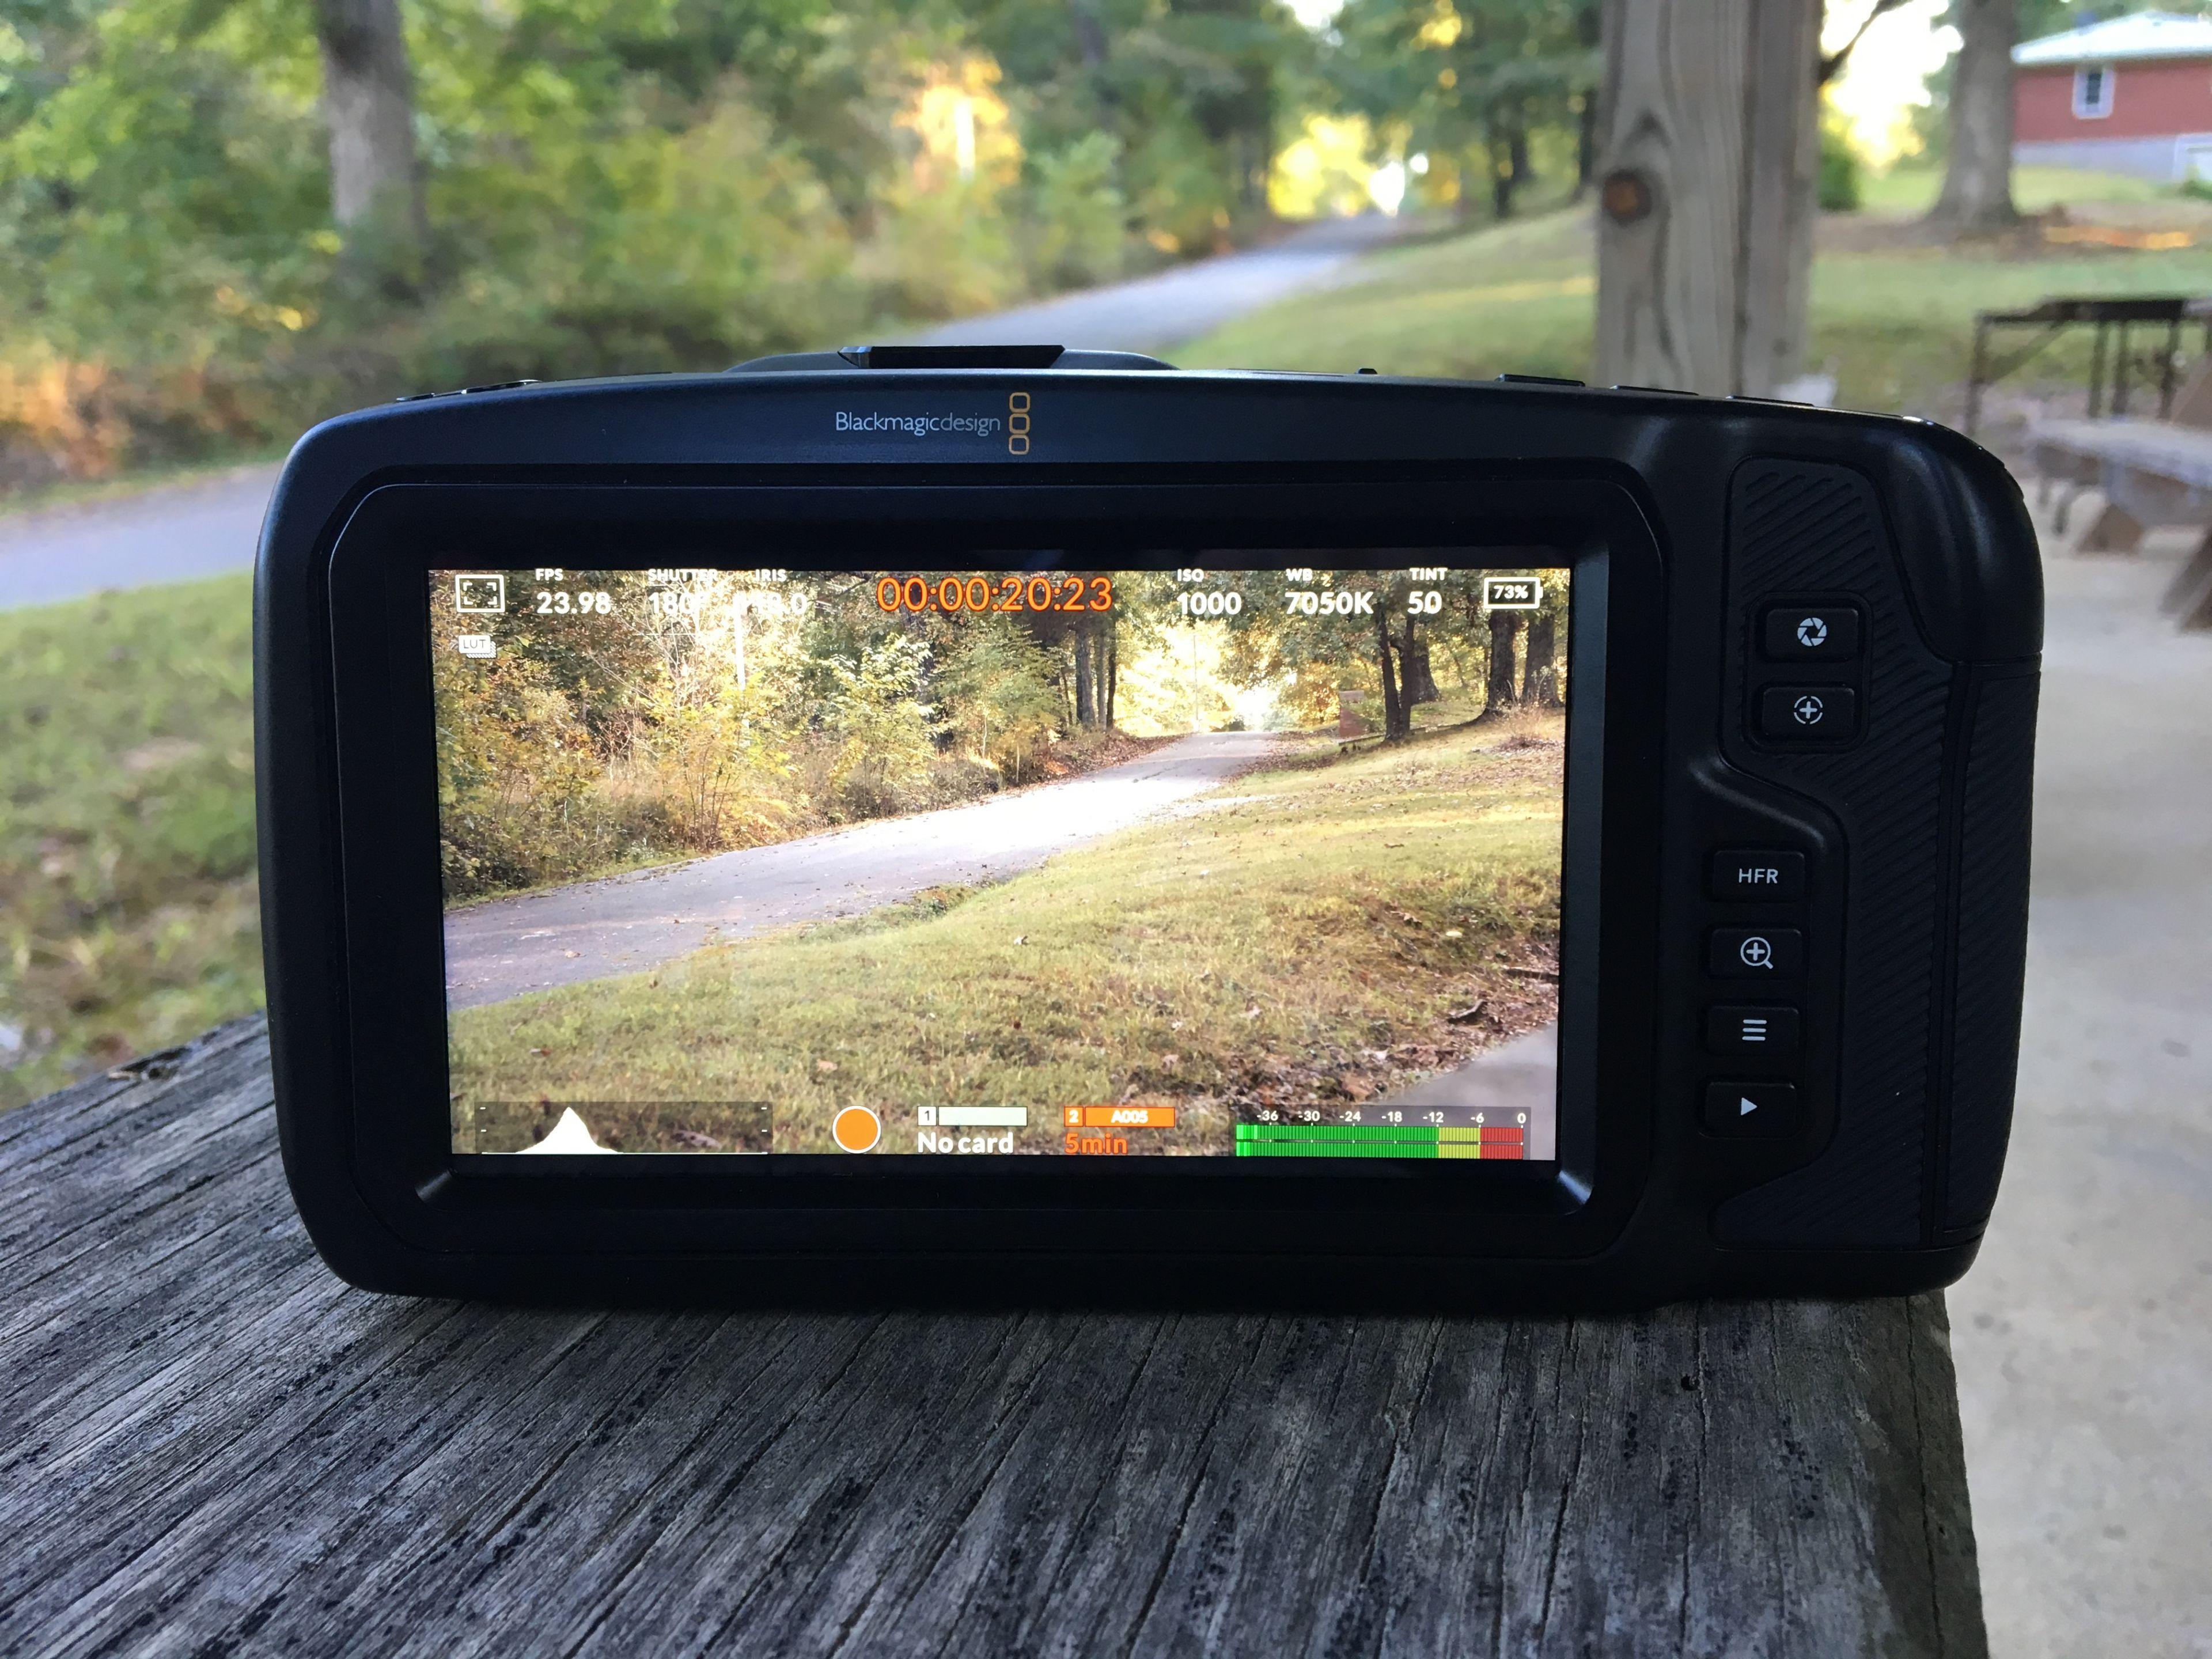 Pocket Cinema Camera